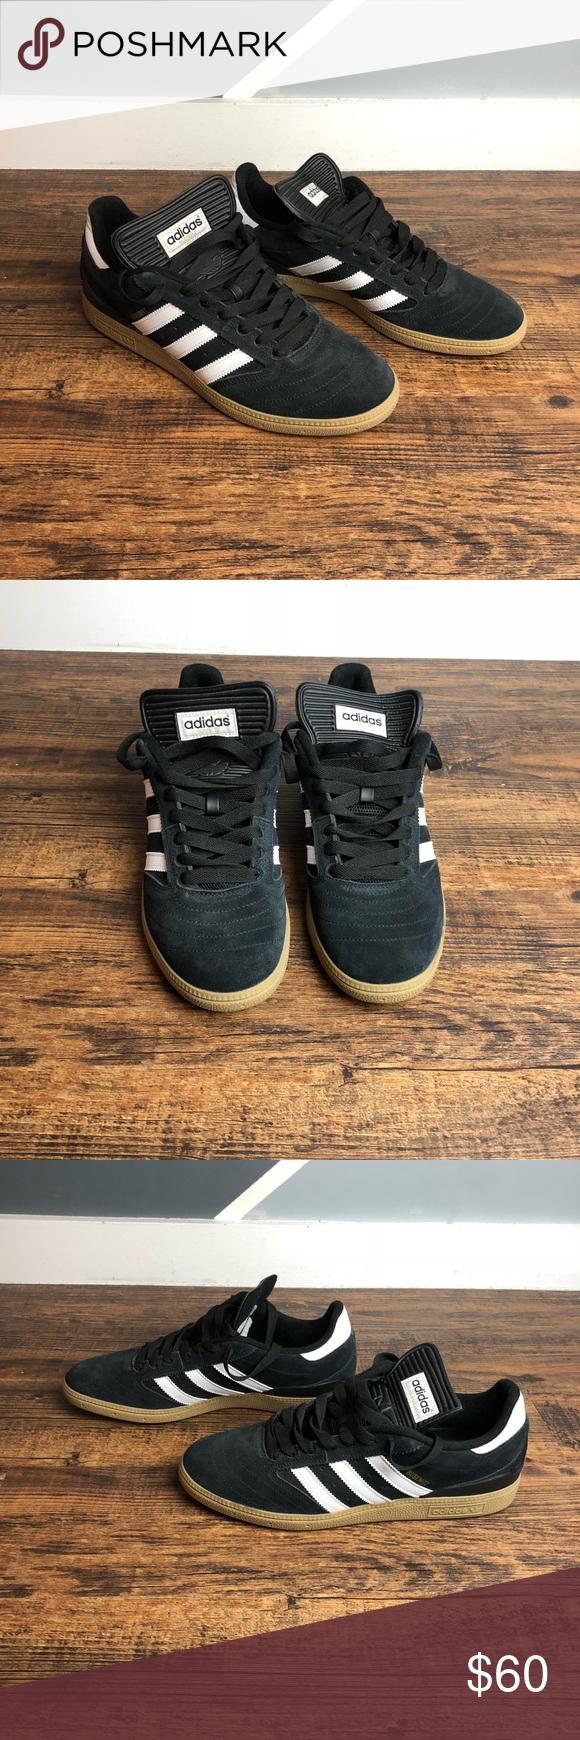 extinción olvidadizo Tumor maligno  Adidas Busenitz Pro Black White G48060 Size 11 Brand New, never worn  Busenitz Pro Shoes. Men's size 11 Skate Sn… | Adidas busenitz, Shoes  sneakers adidas, Sneakers